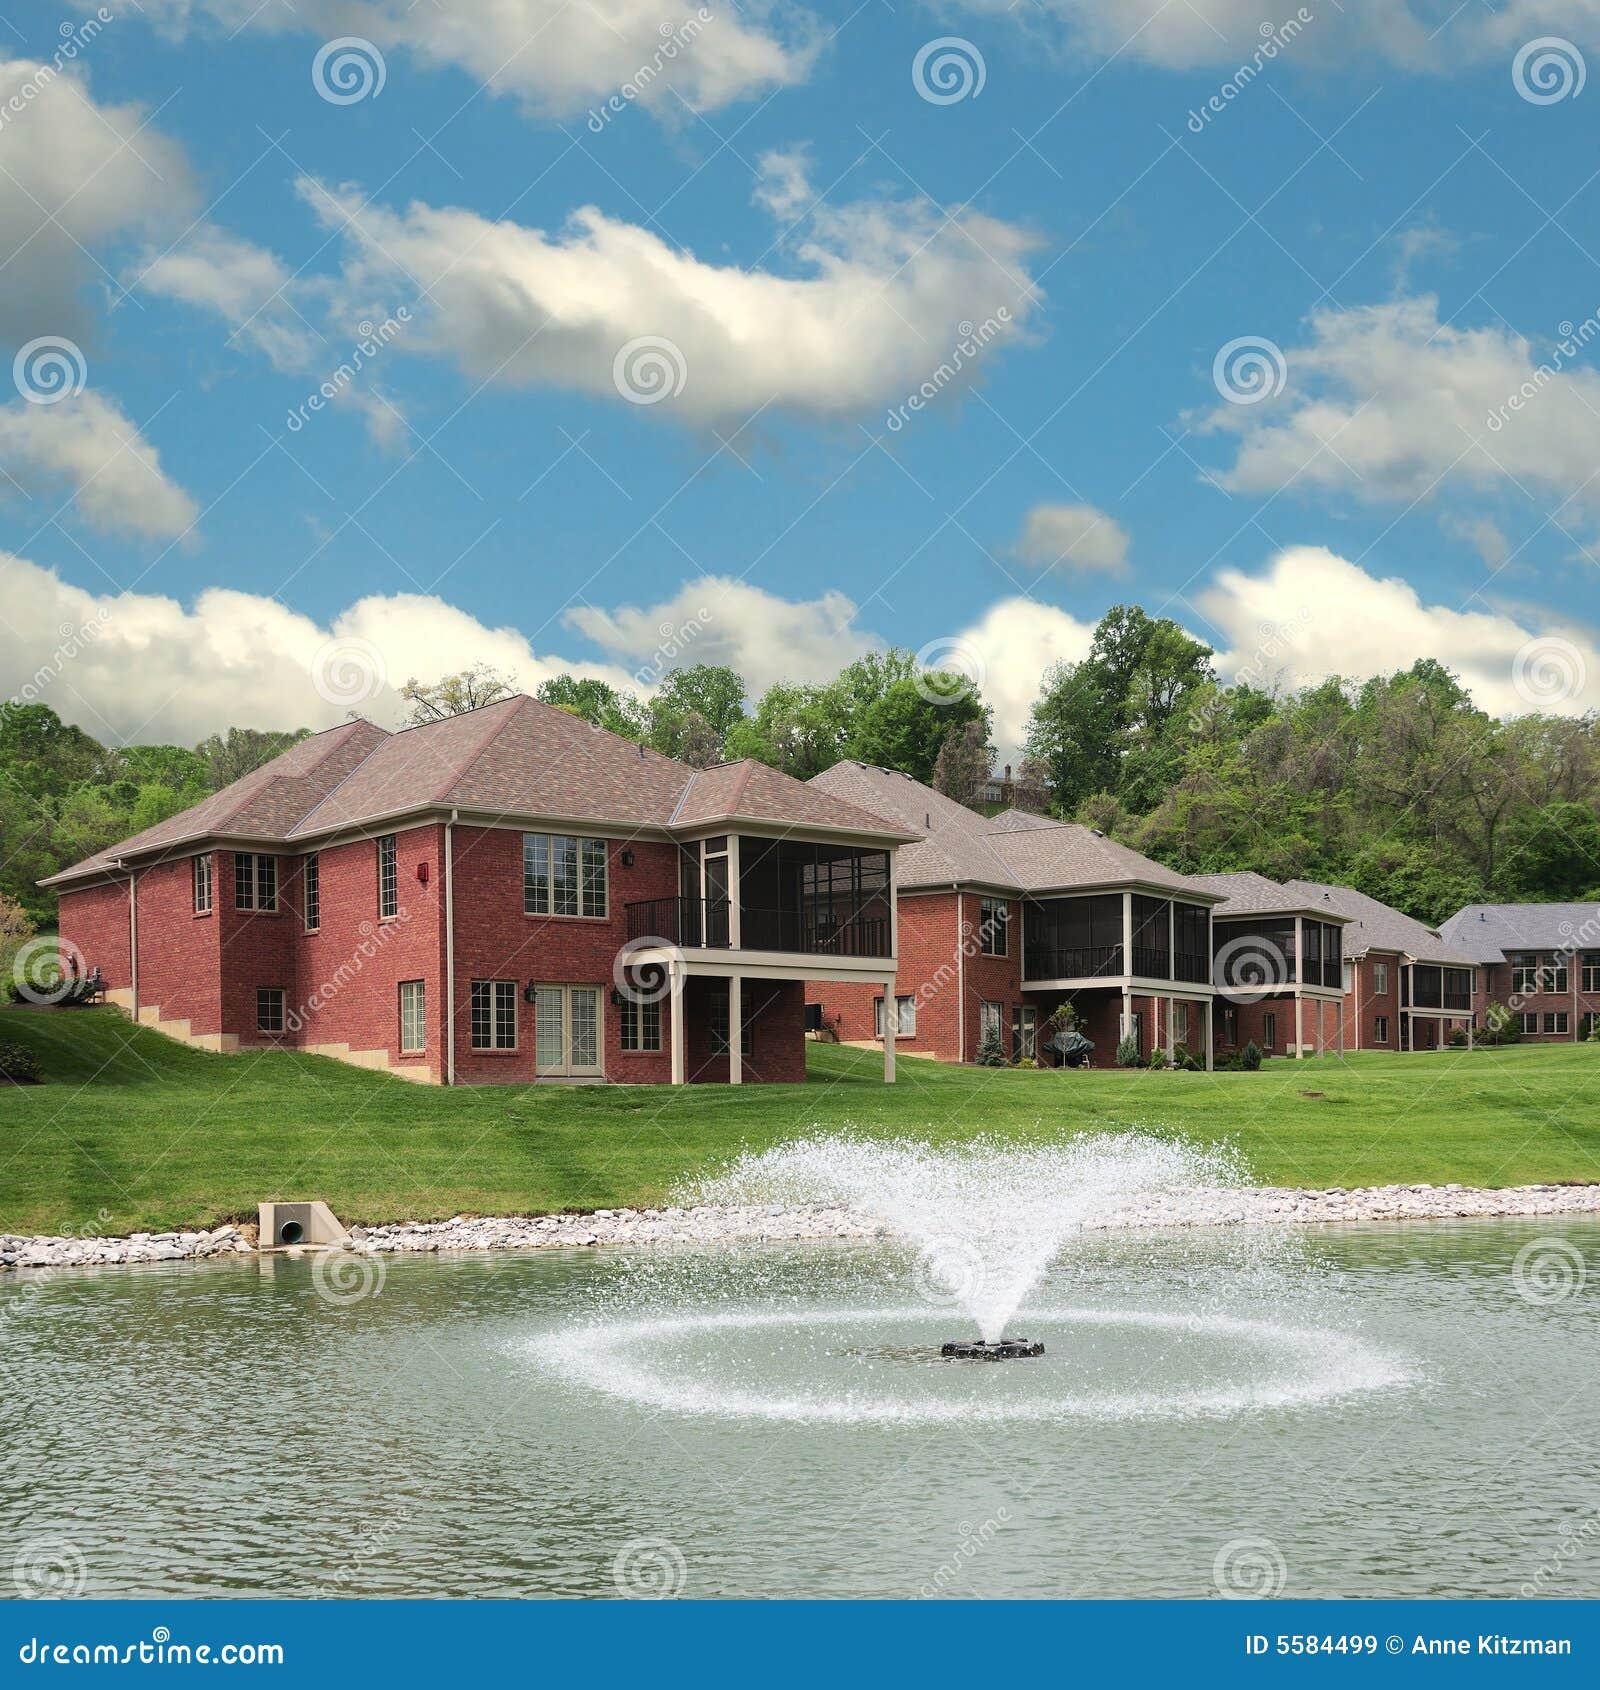 Lakeside Landominium Homes Royalty Free Stock Images